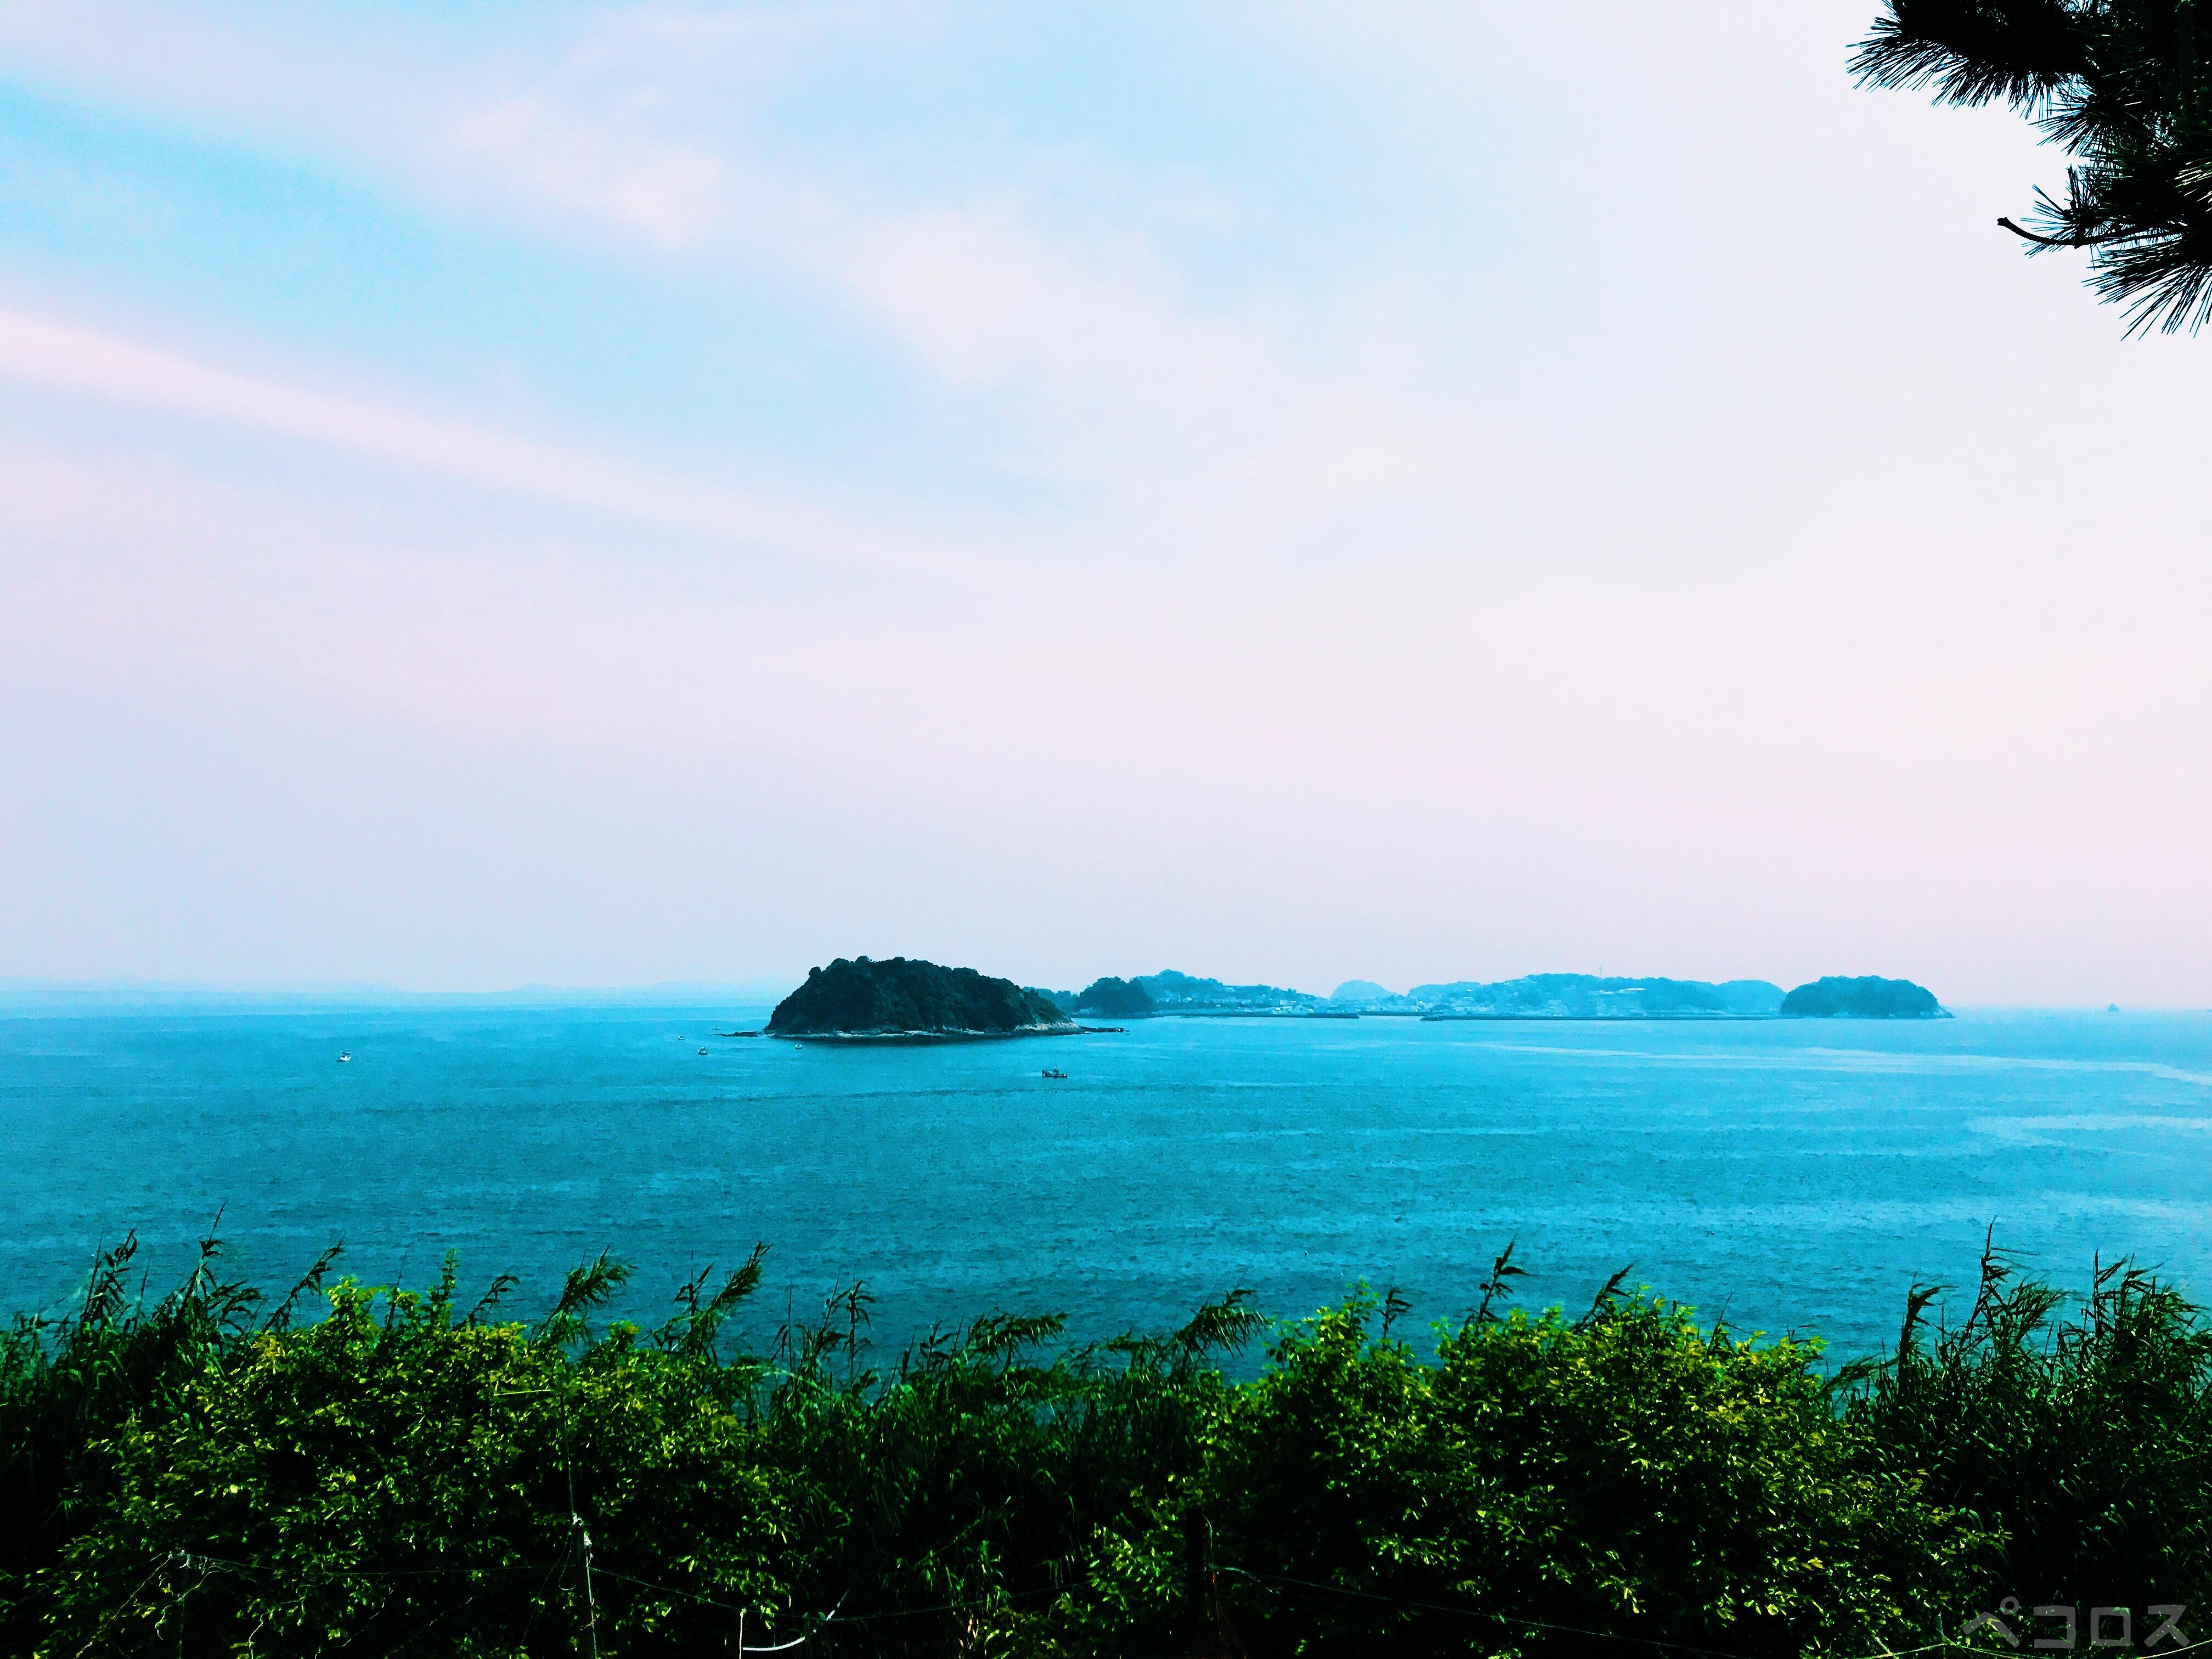 愛知県 日間賀島の海